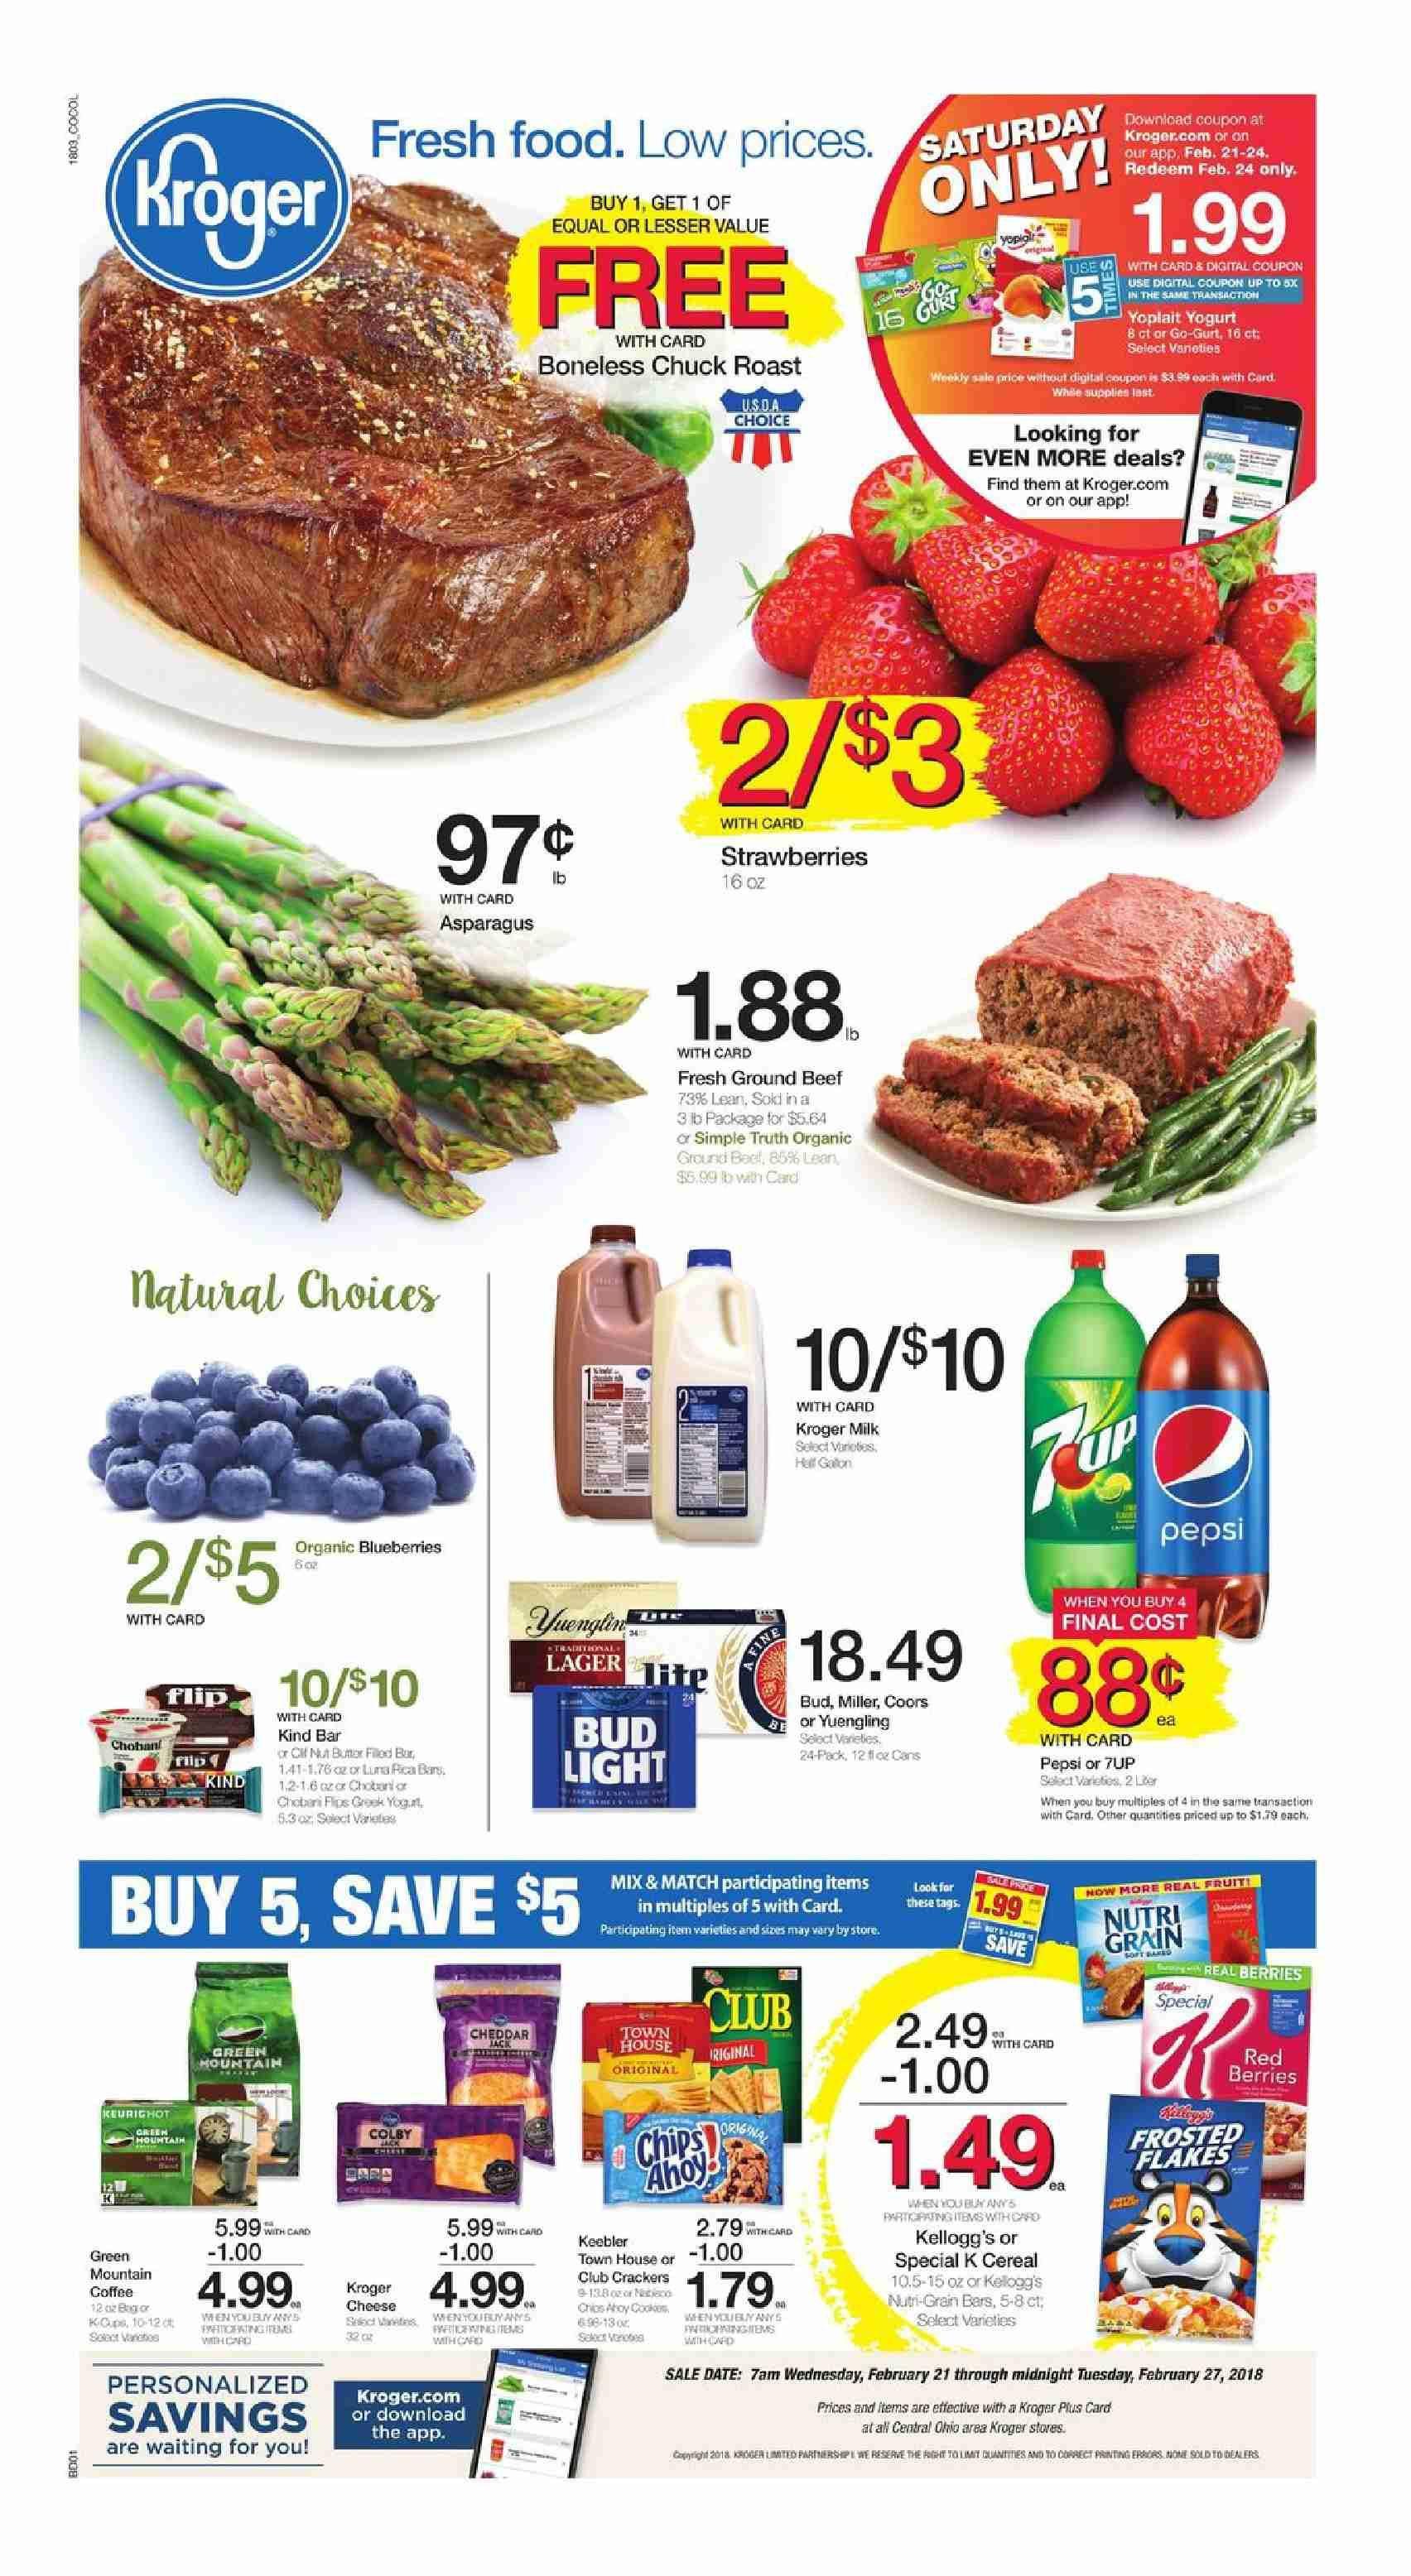 Kroger Weekly Ad Flyer March 11 17 2020 Weeklyad123 Com Kroger Weekly Ads Food